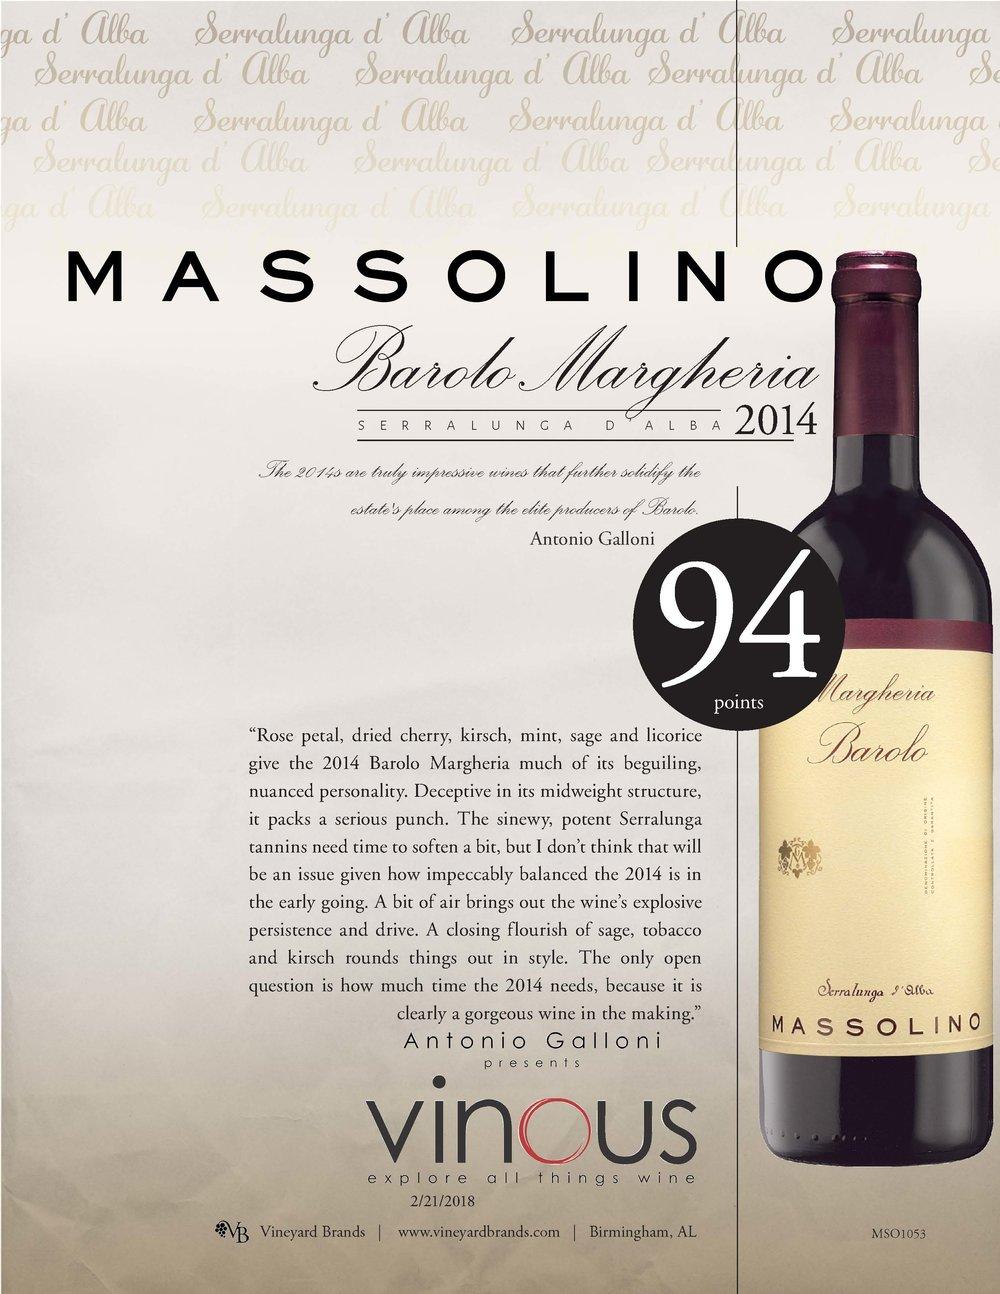 Massolino Barolo Margheria 2014.jpg